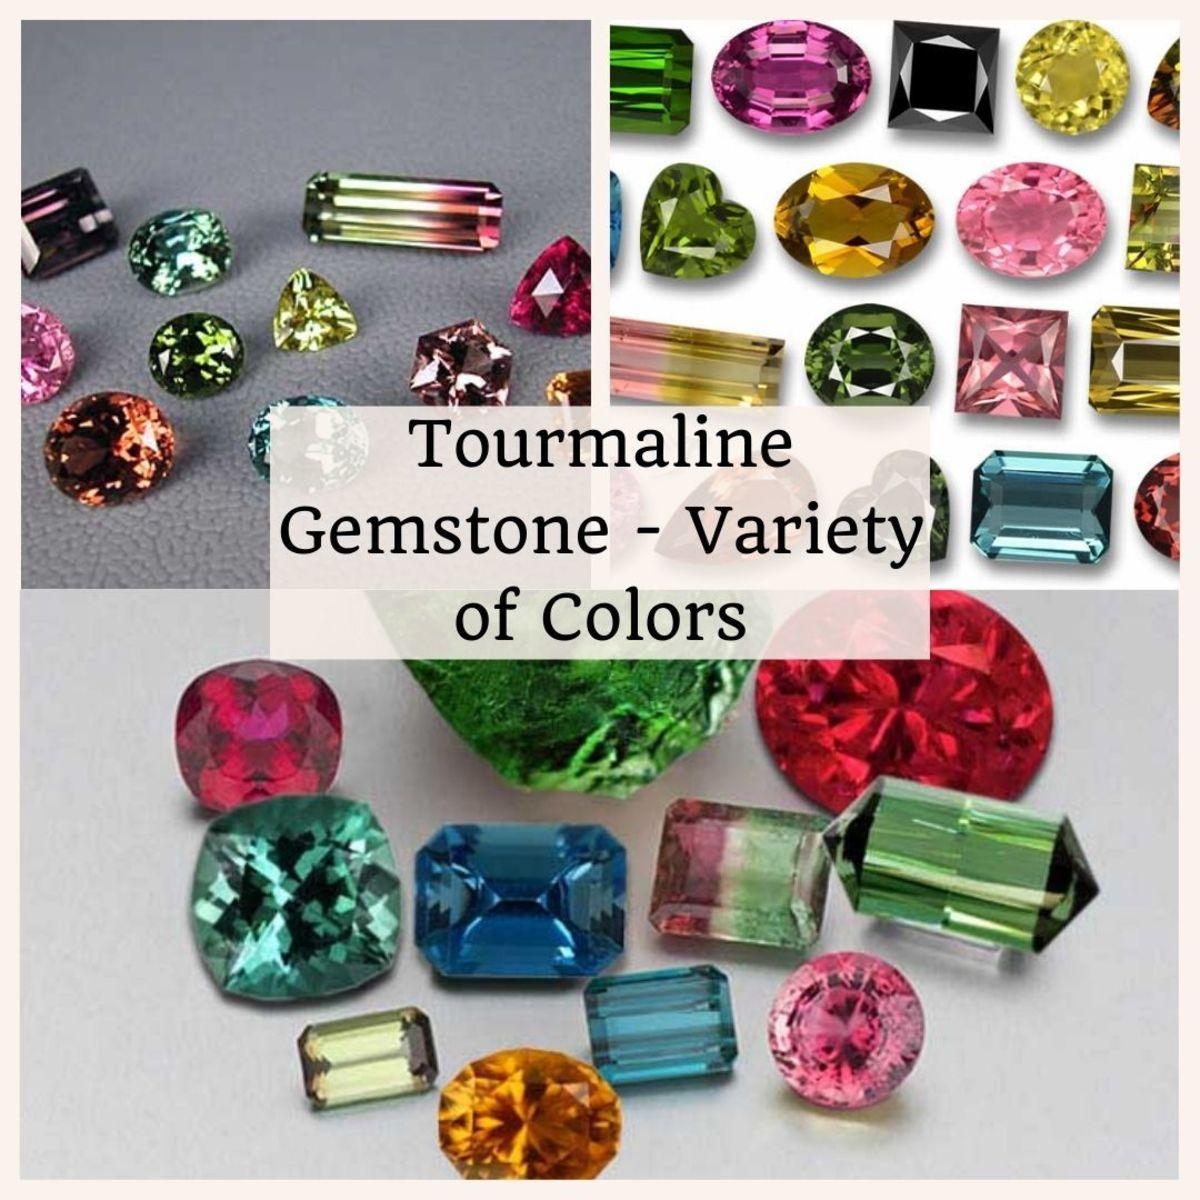 Tourmaline Gemstone Variety of Colors